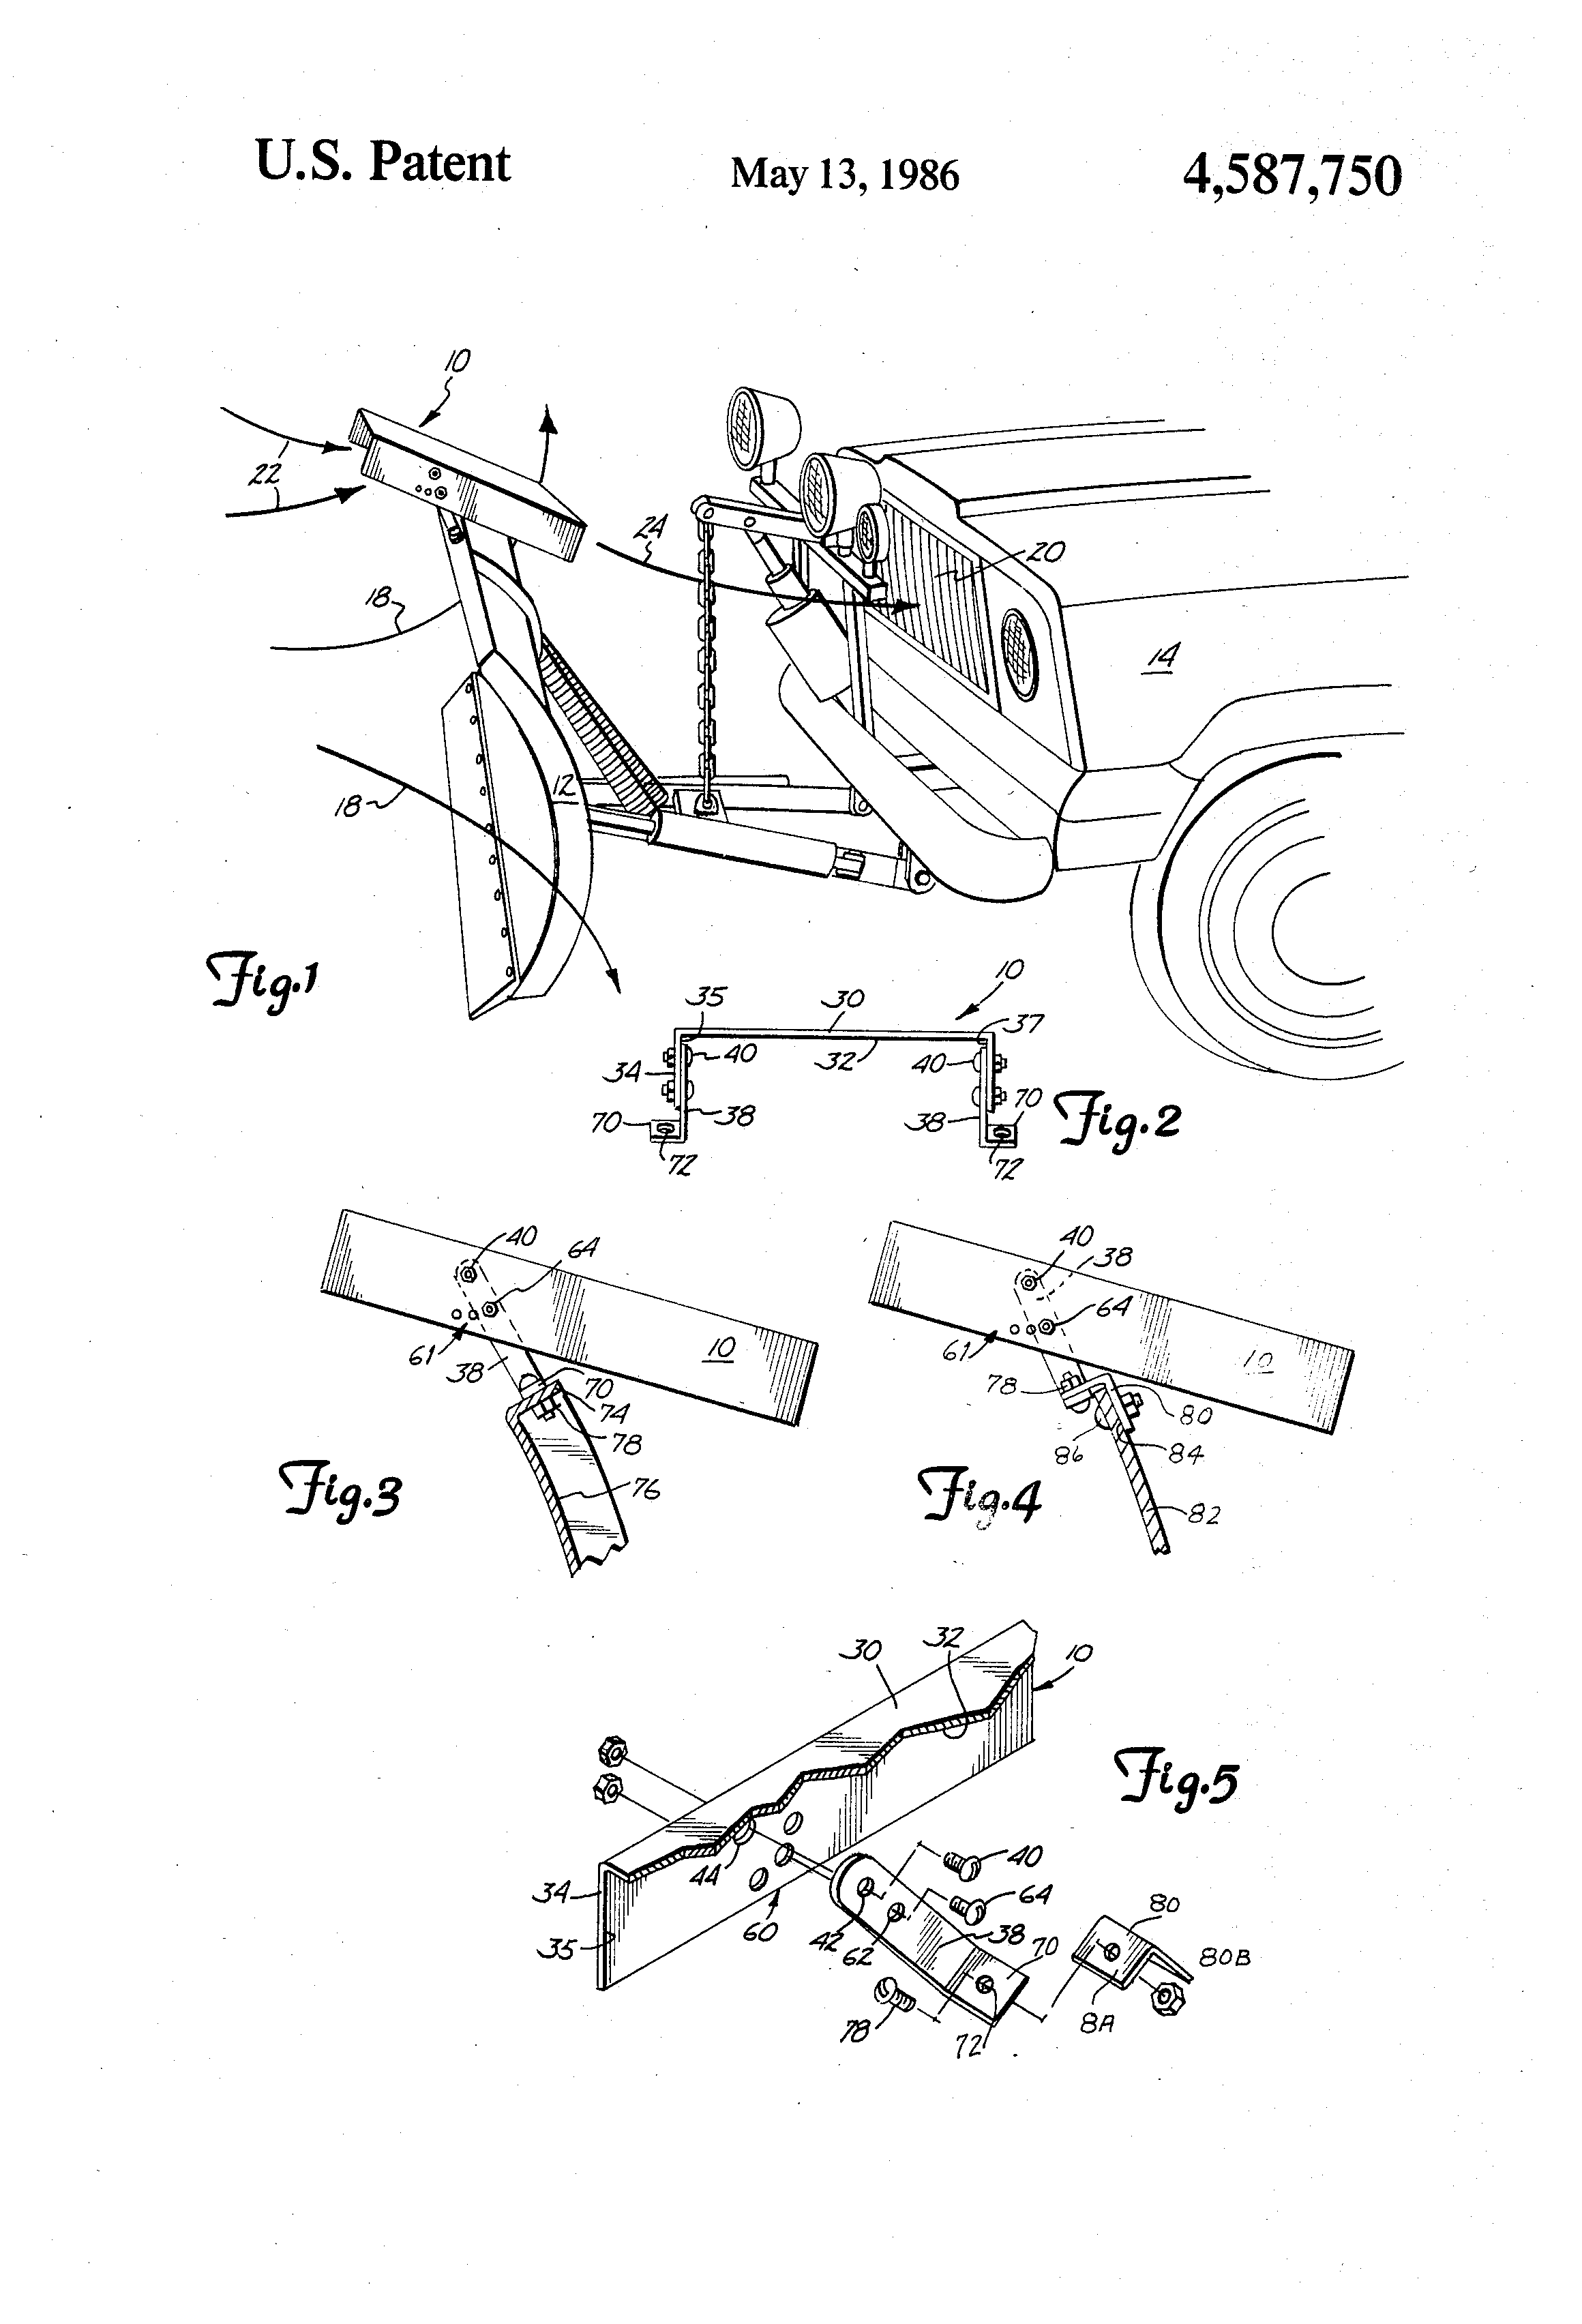 Snow Plow Air Intake : Patent us air scoop mounted on snow plow google